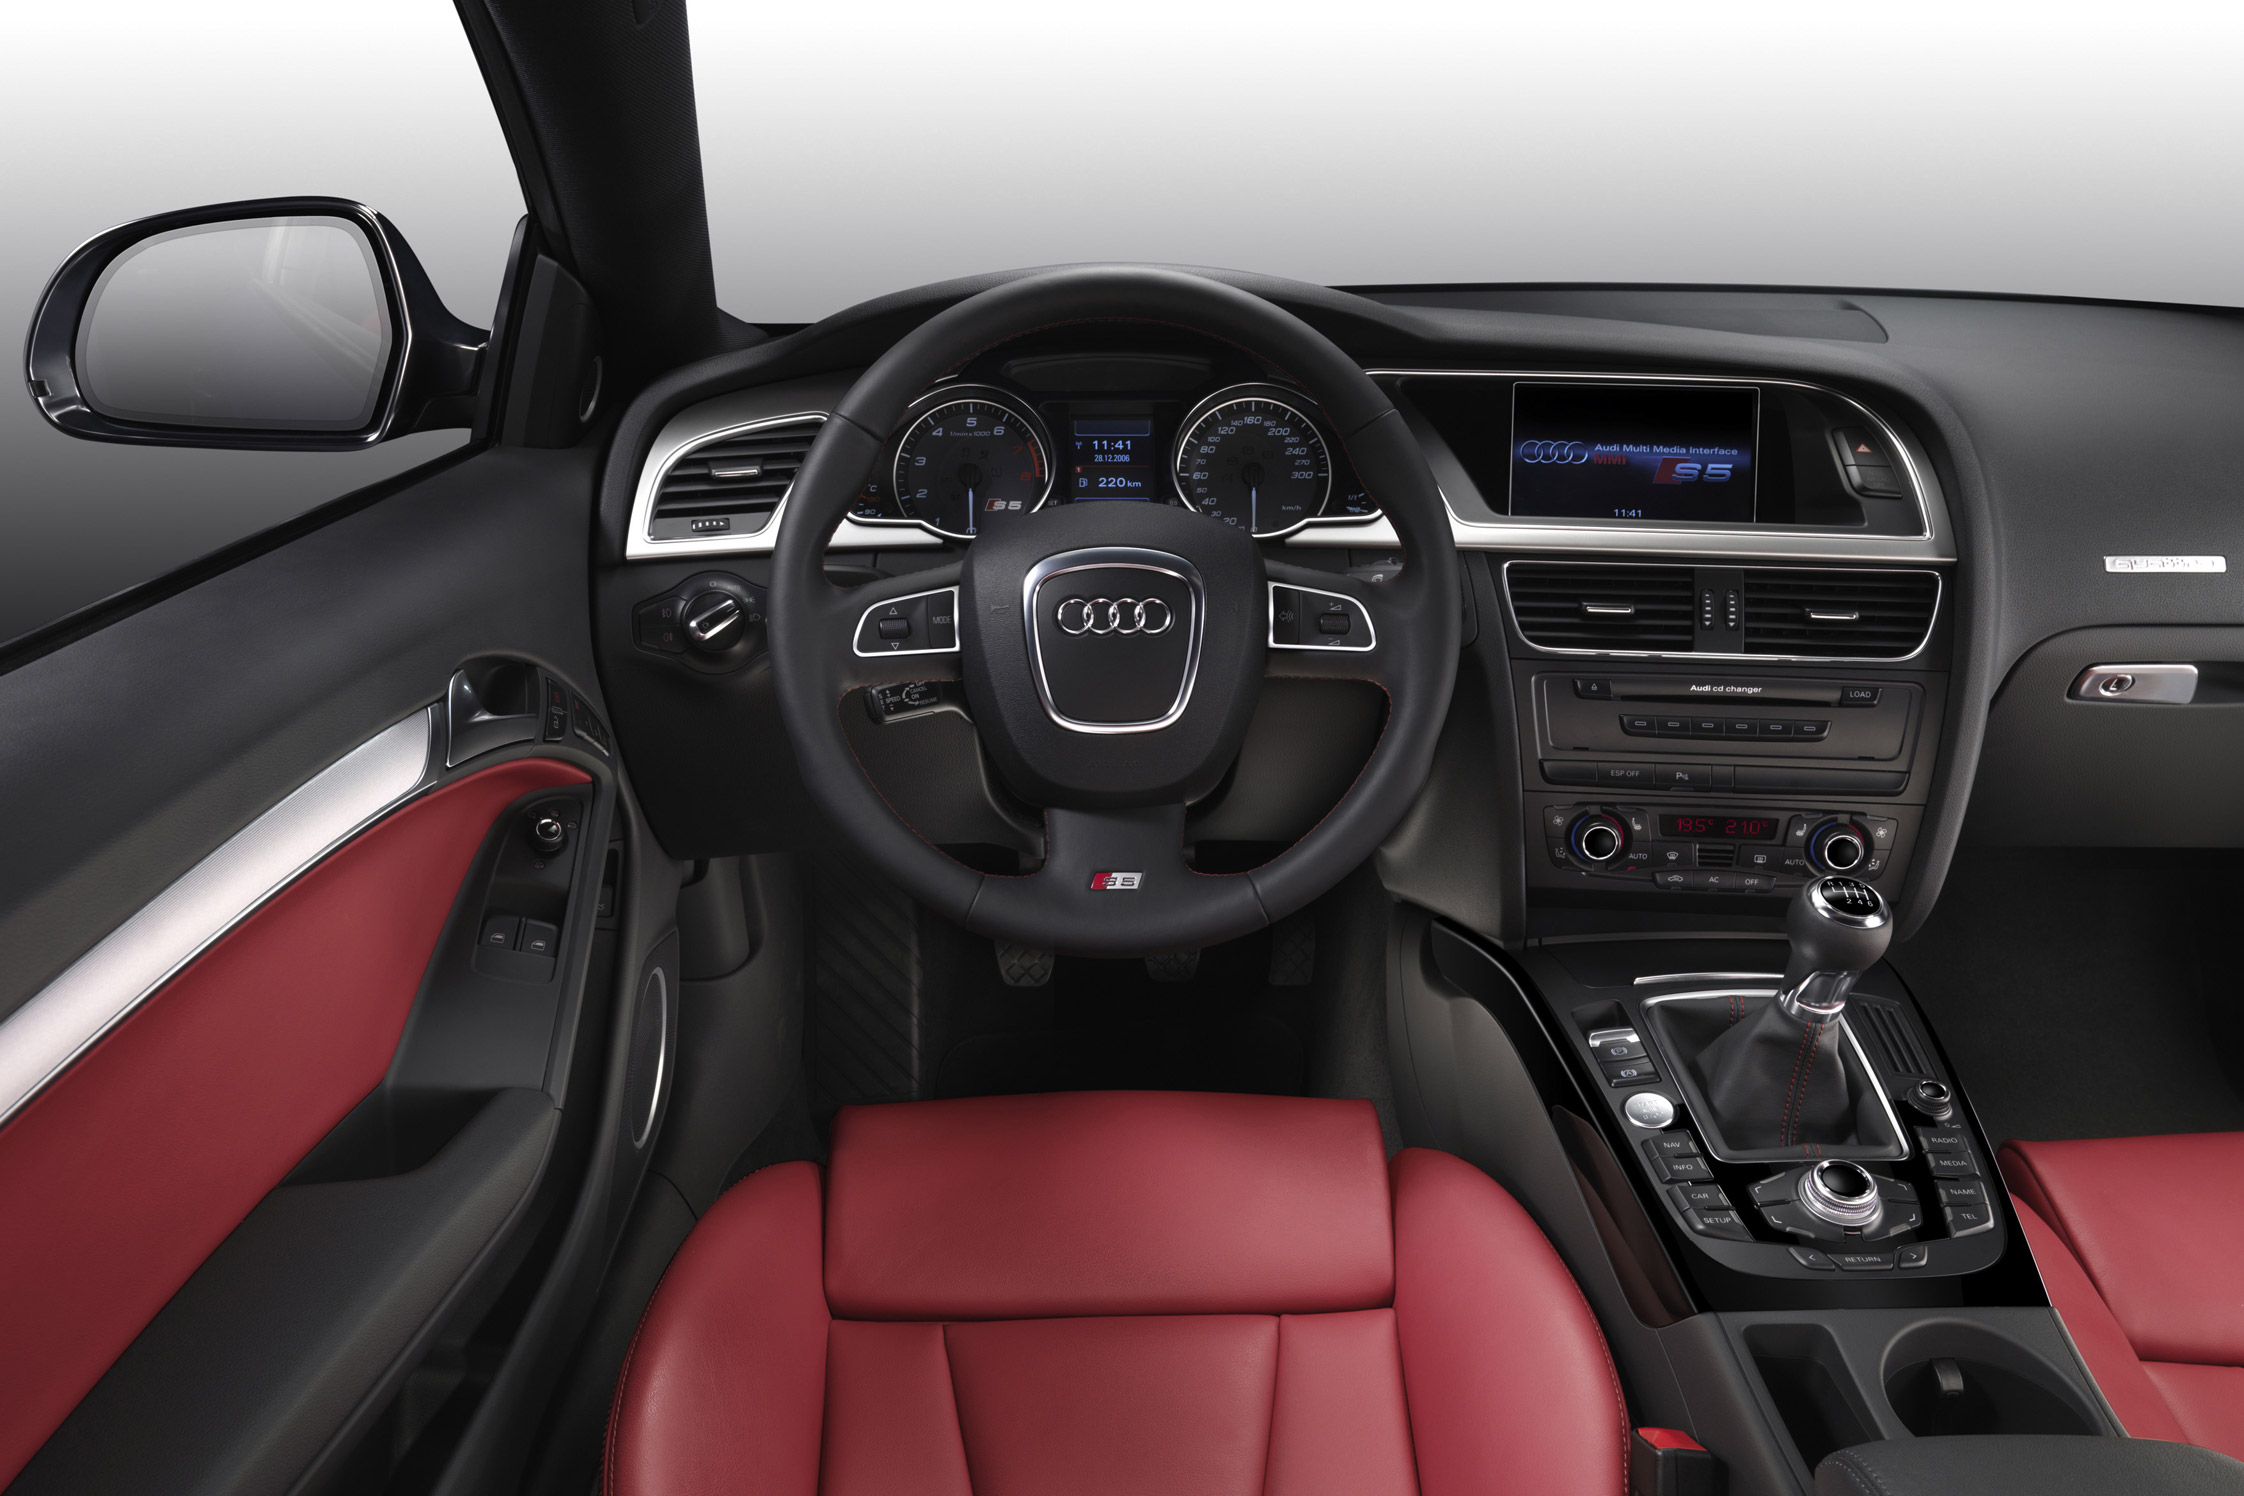 Essai Audi S5 Motorlegend